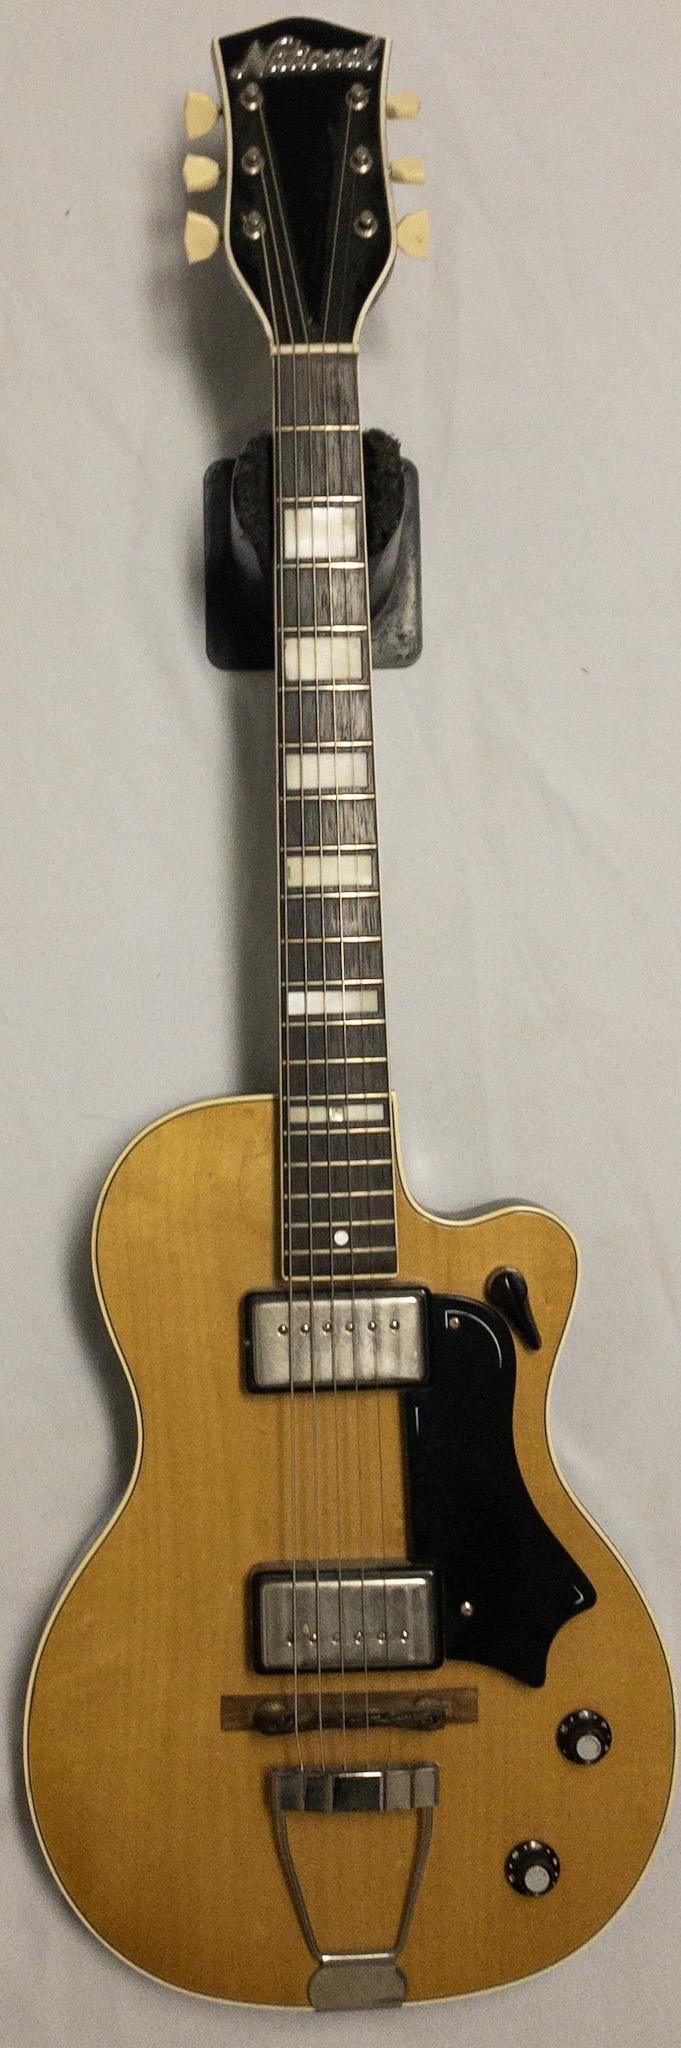 vintage national avalon electric guitar south austin music new used and vintage instruments. Black Bedroom Furniture Sets. Home Design Ideas